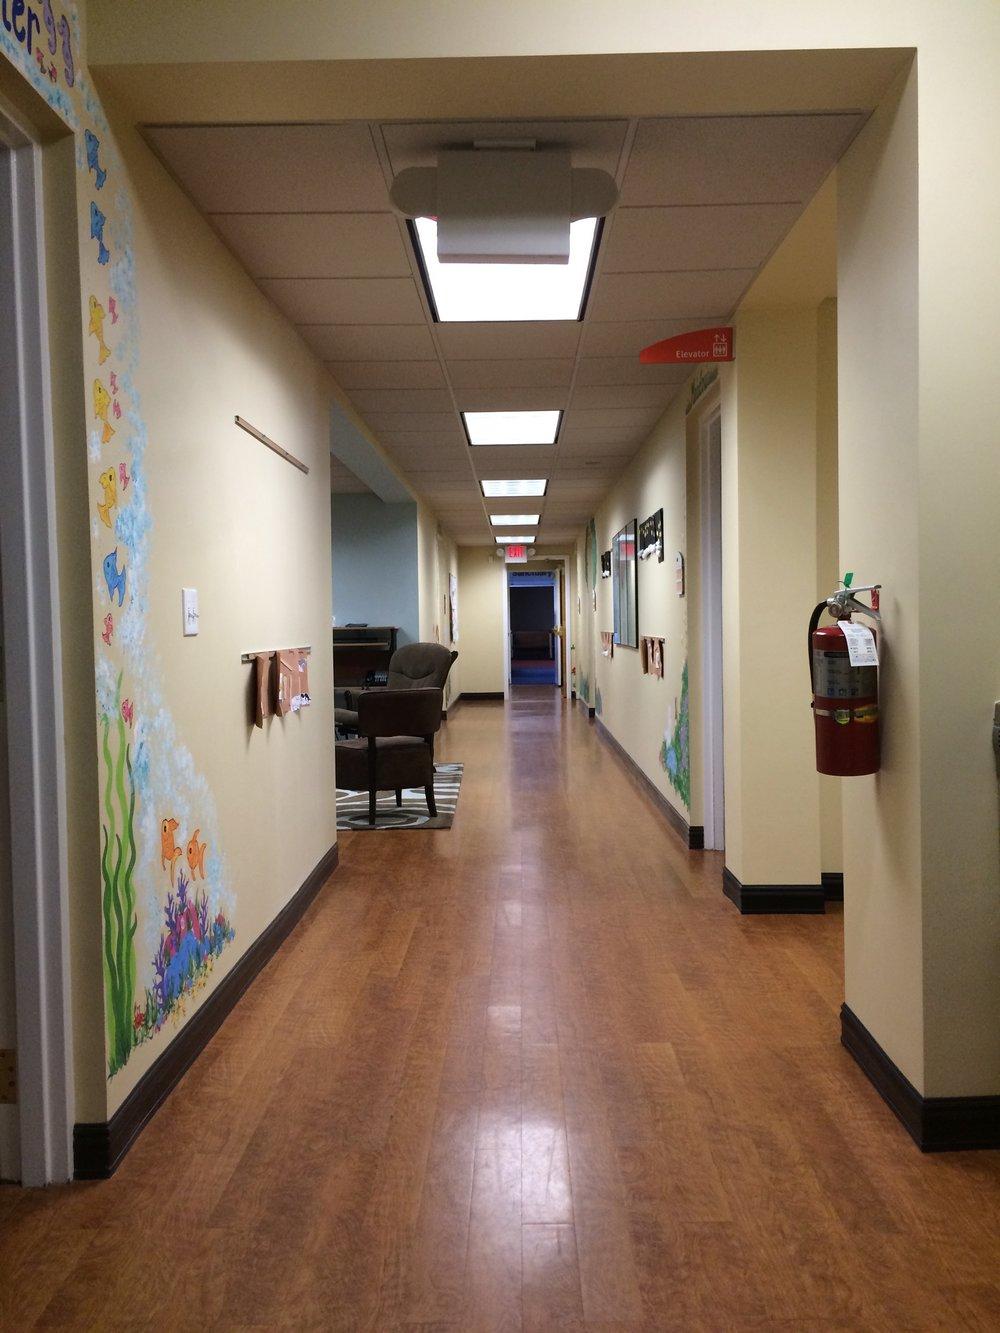 Our Preschool Hall.